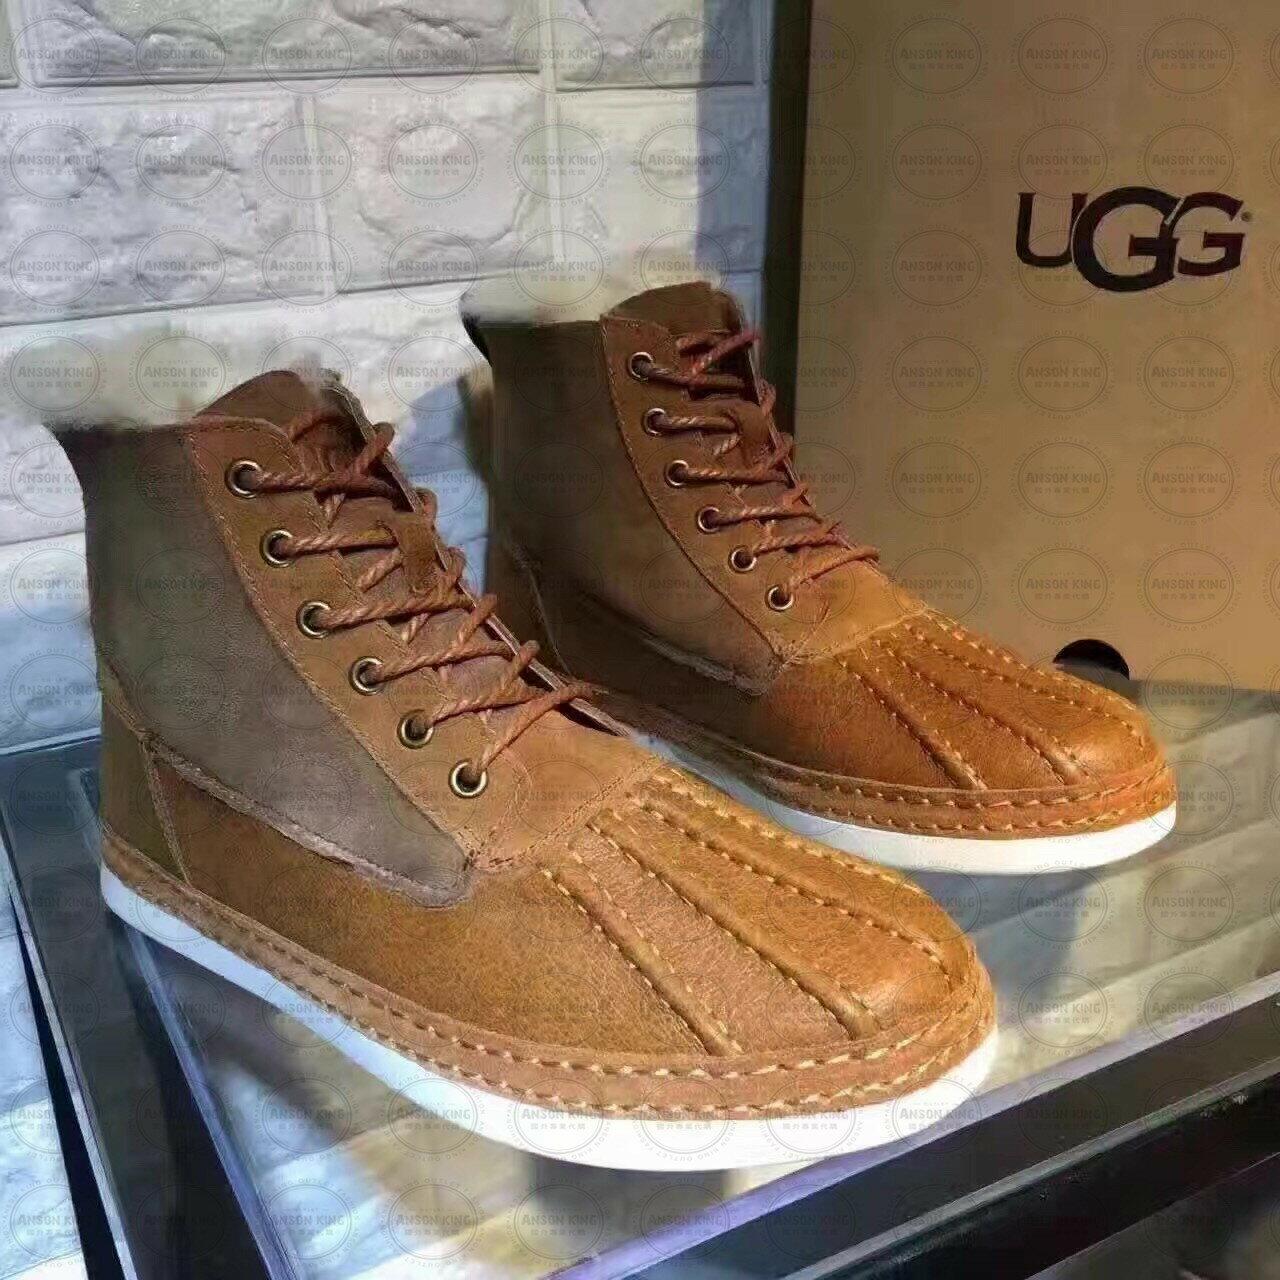 OUTLET正品代購 澳洲 UGG 冬季男款貝殼頭馬丁靴 短靴 保暖 真皮羊皮毛 雪靴 短靴 栗色 0